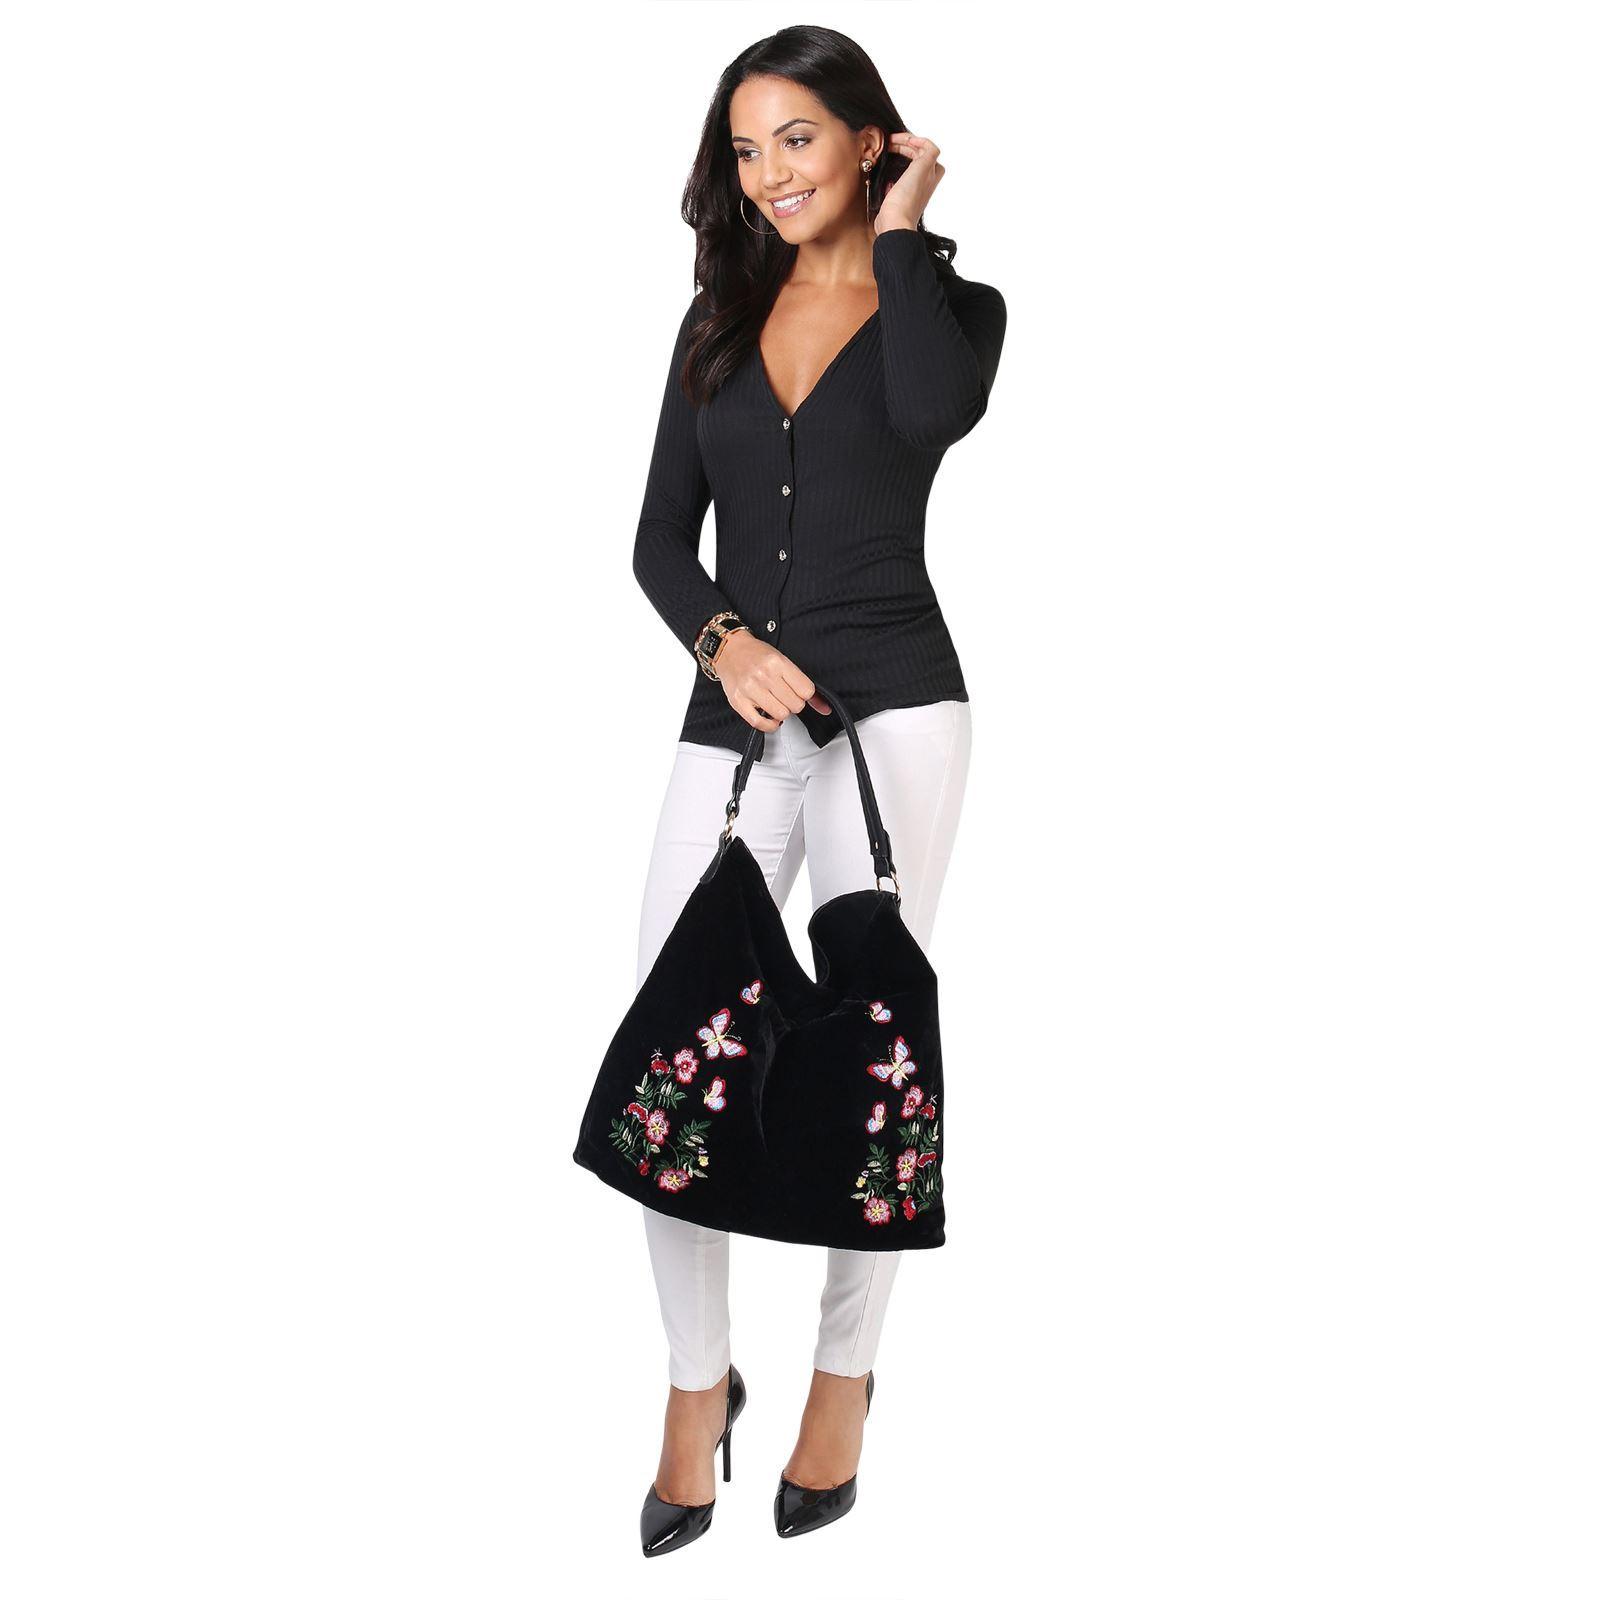 Rebeca-Mujer-Corta-Botones-Basica-Acanalada-Barata-Oferta-Casual-Ligera-Fina miniatura 18